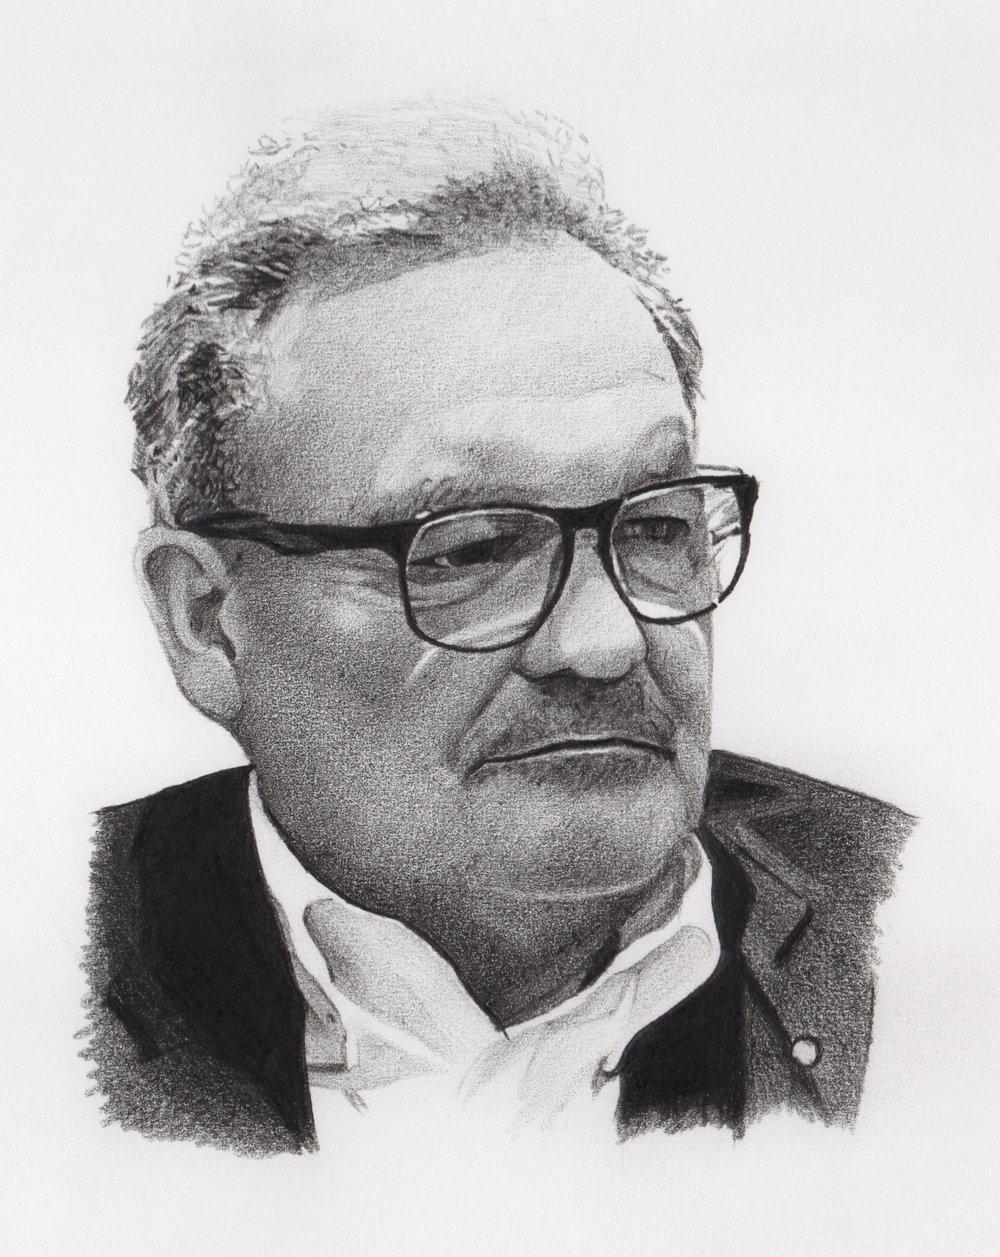 Stefan Klotzner